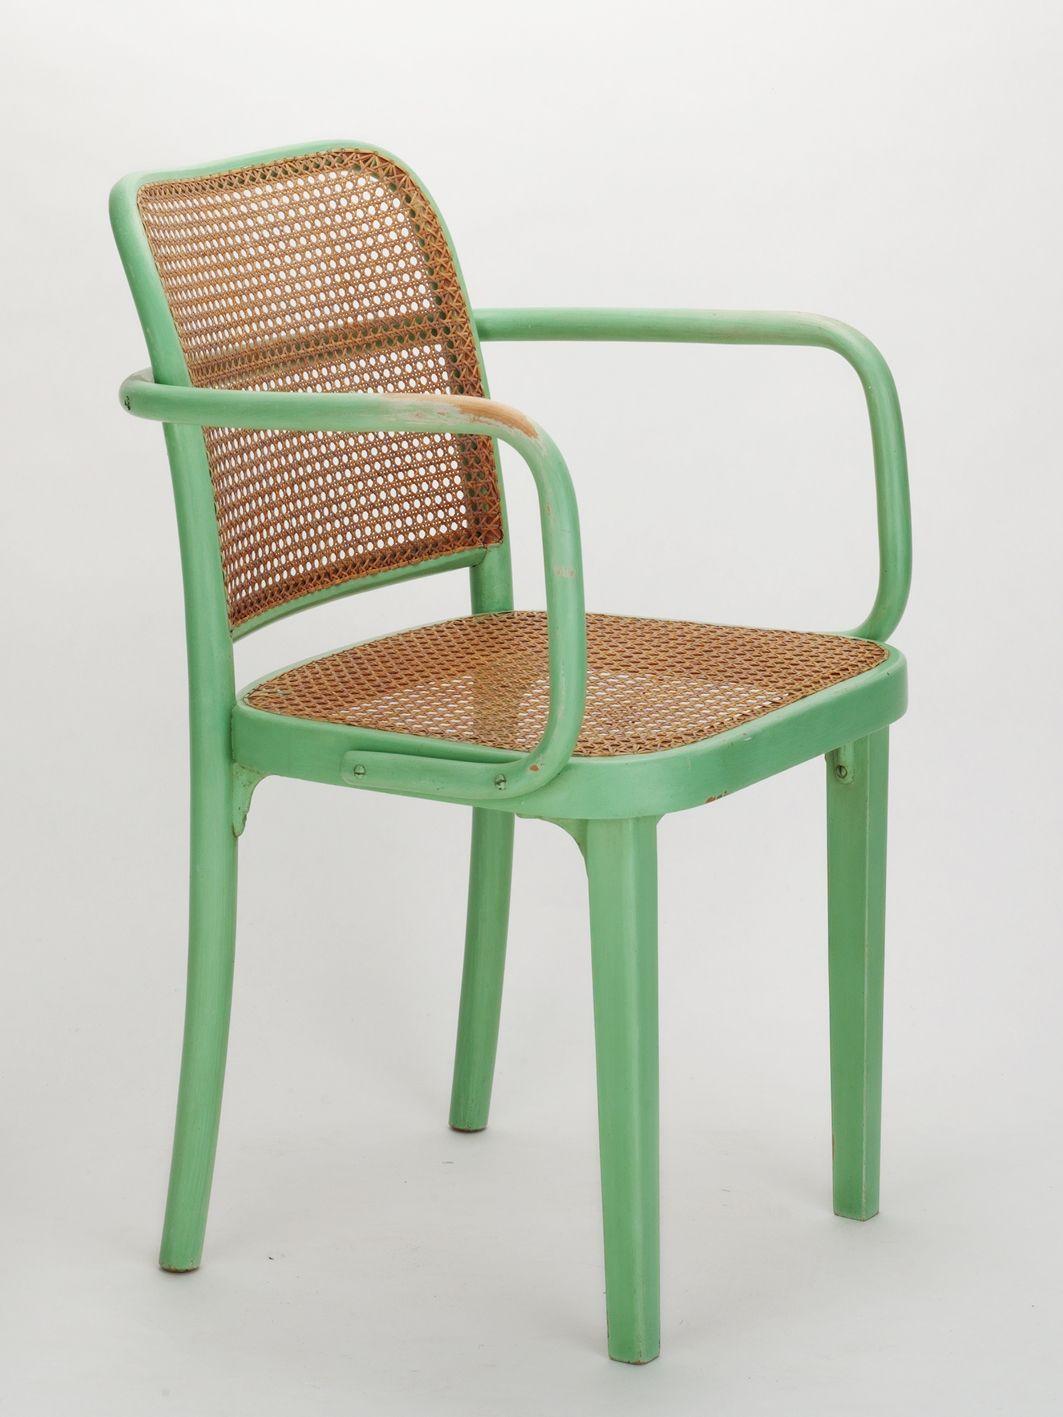 josef hoffmann armlehnstuhl a 811 f 1930 chairs pinterest stuhl art deco m bel und m bel. Black Bedroom Furniture Sets. Home Design Ideas